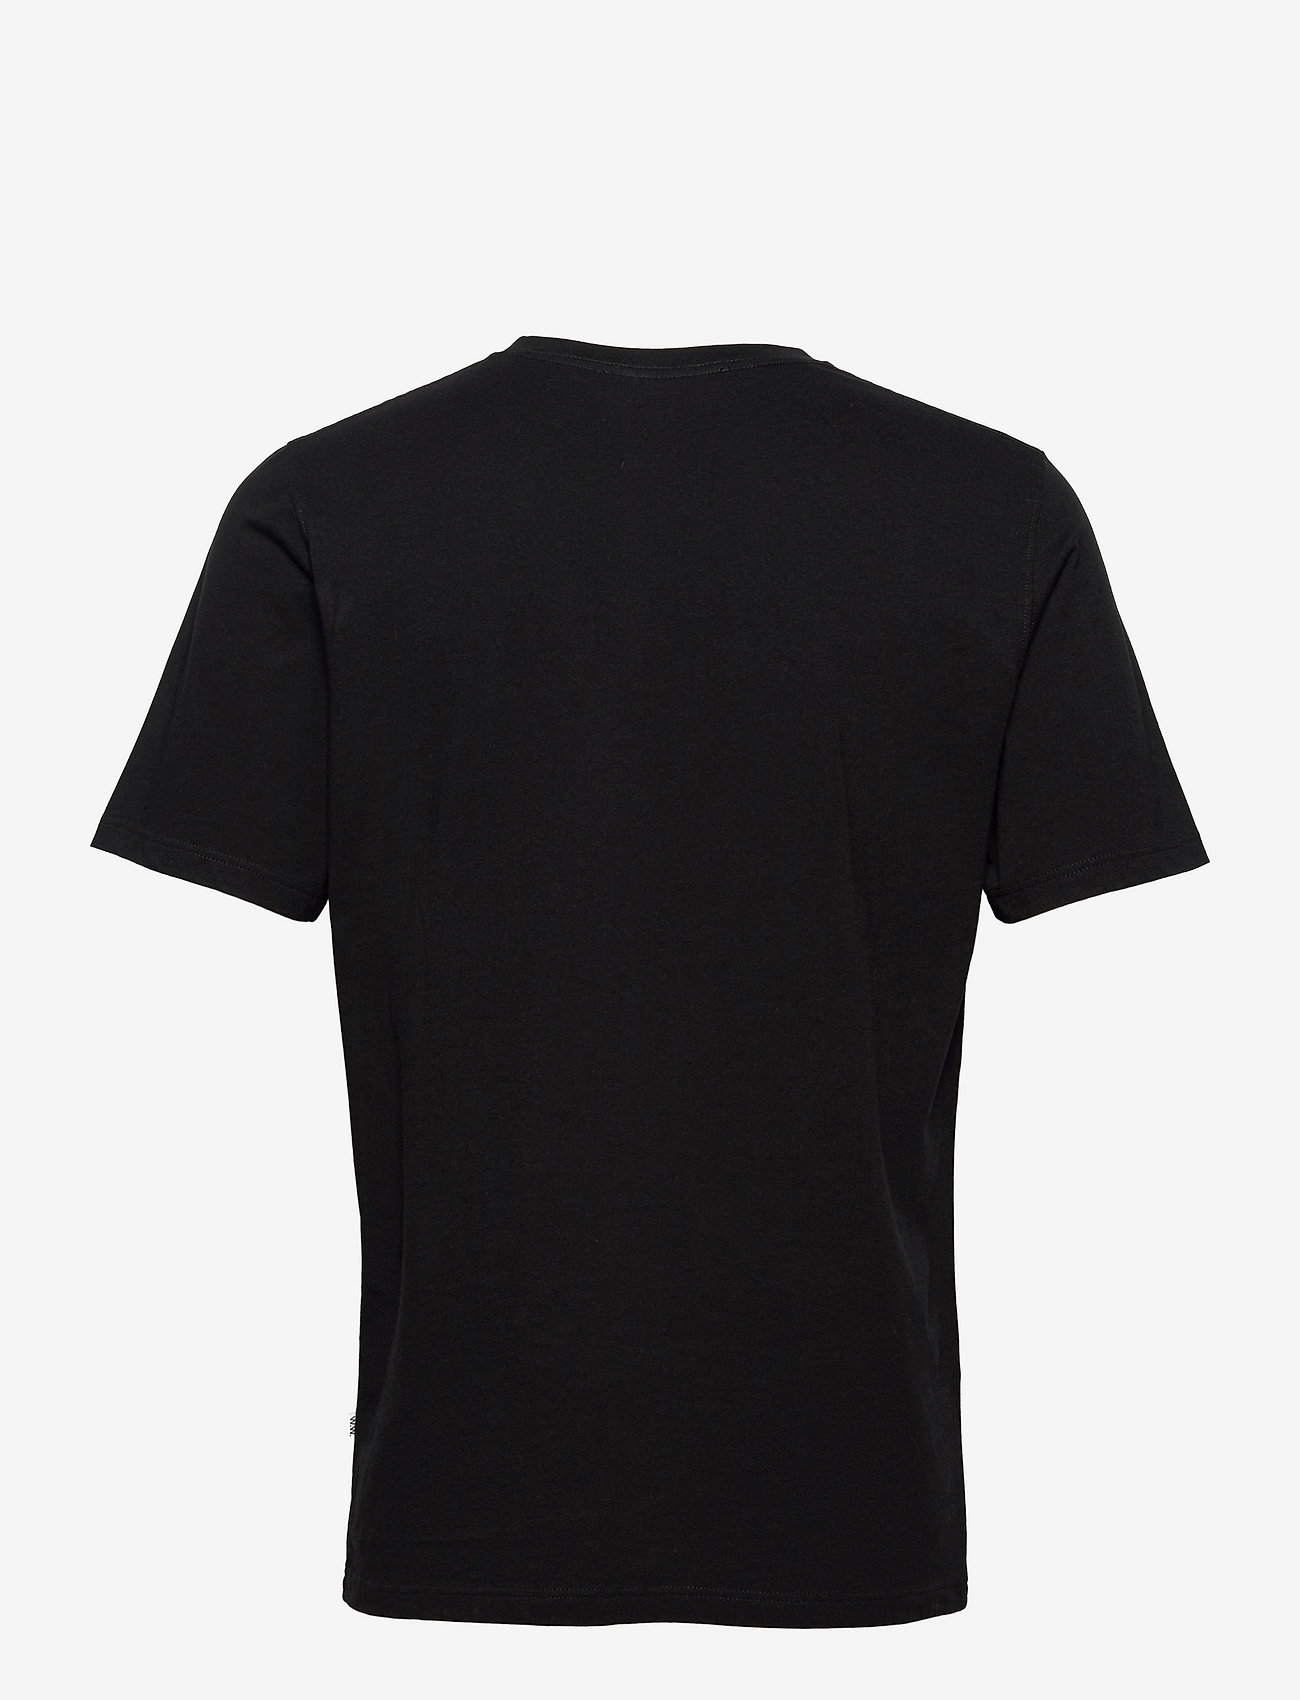 Wood Wood - Sami info T-shirt - basic t-shirts - black - 1